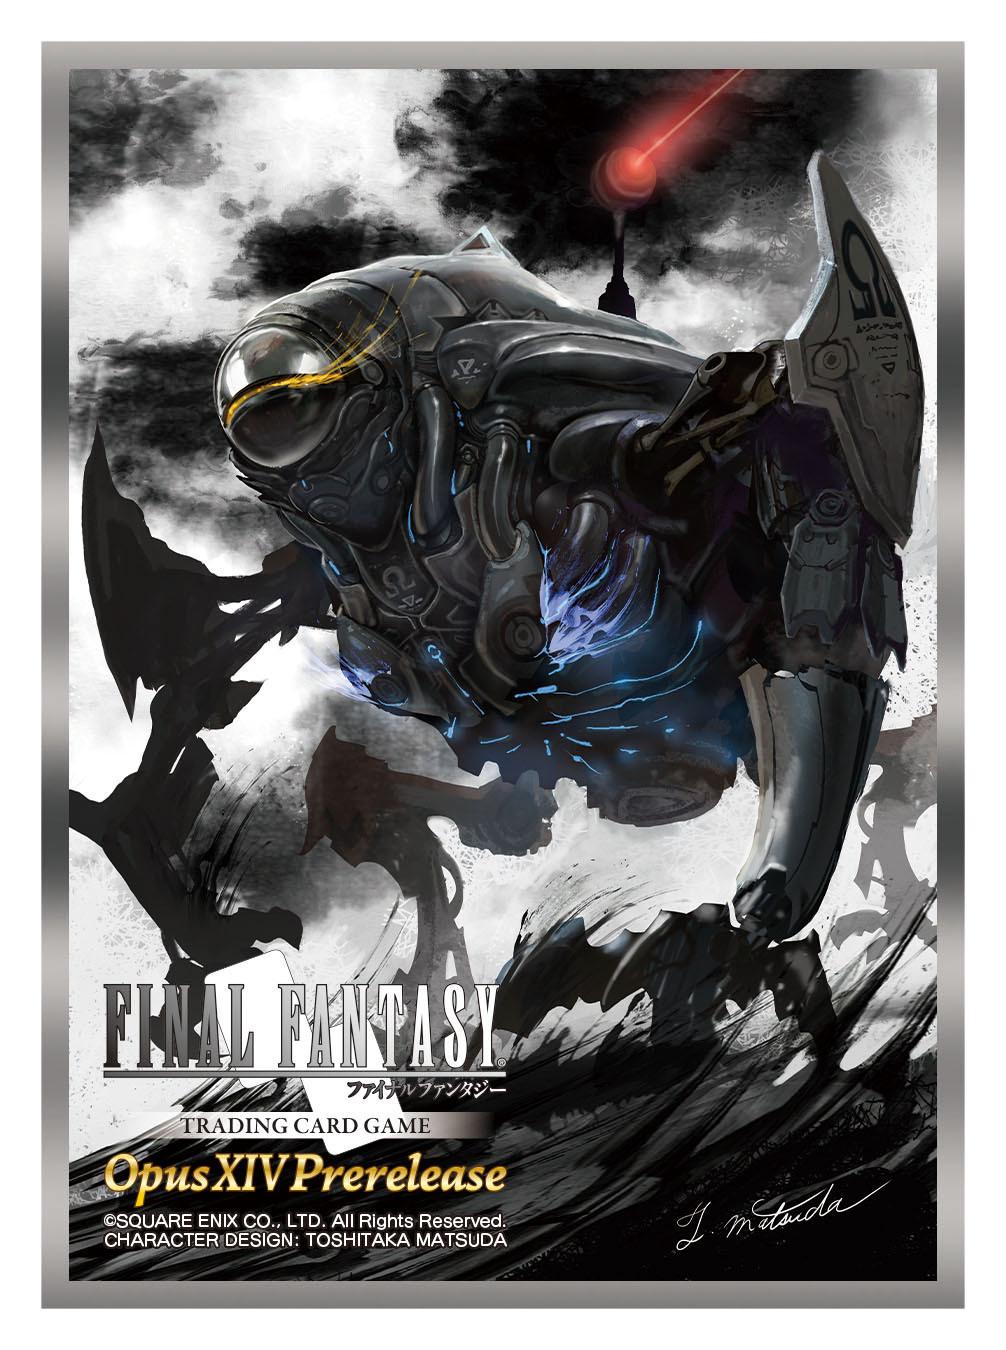 Card Sleeve Art featuring Omega